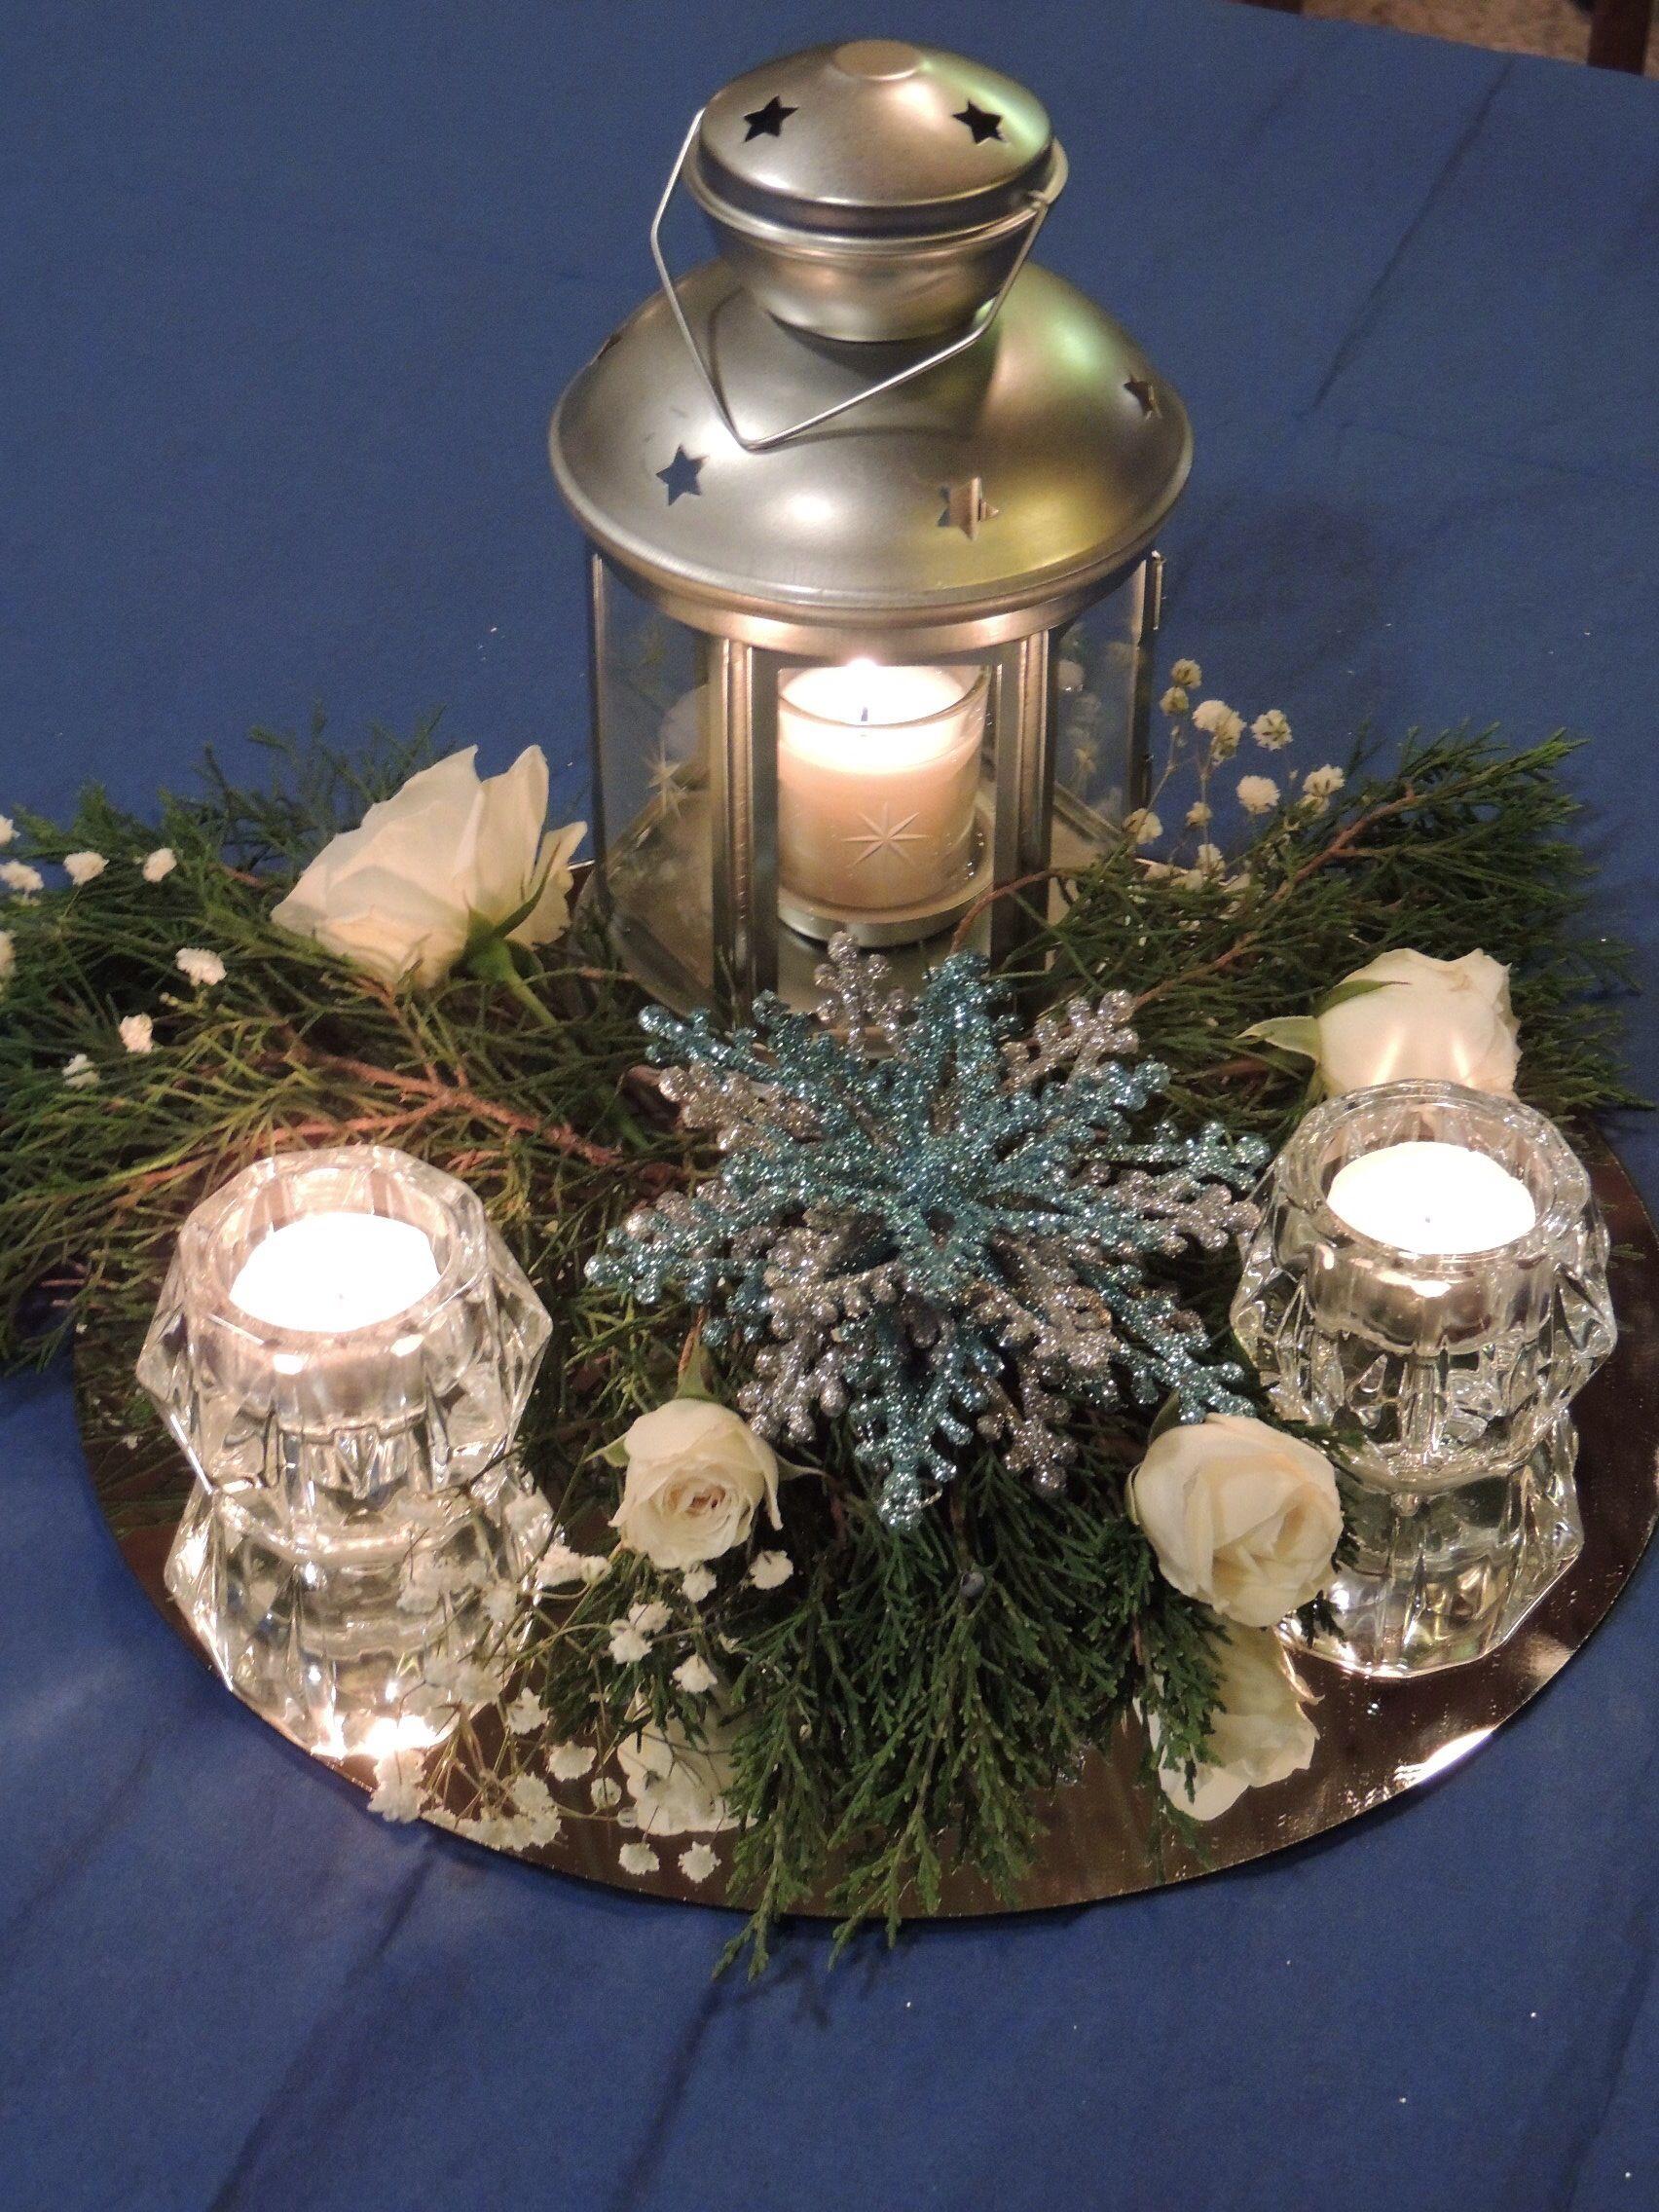 25th wedding anniversary christmas ornament - 25th Anniversary